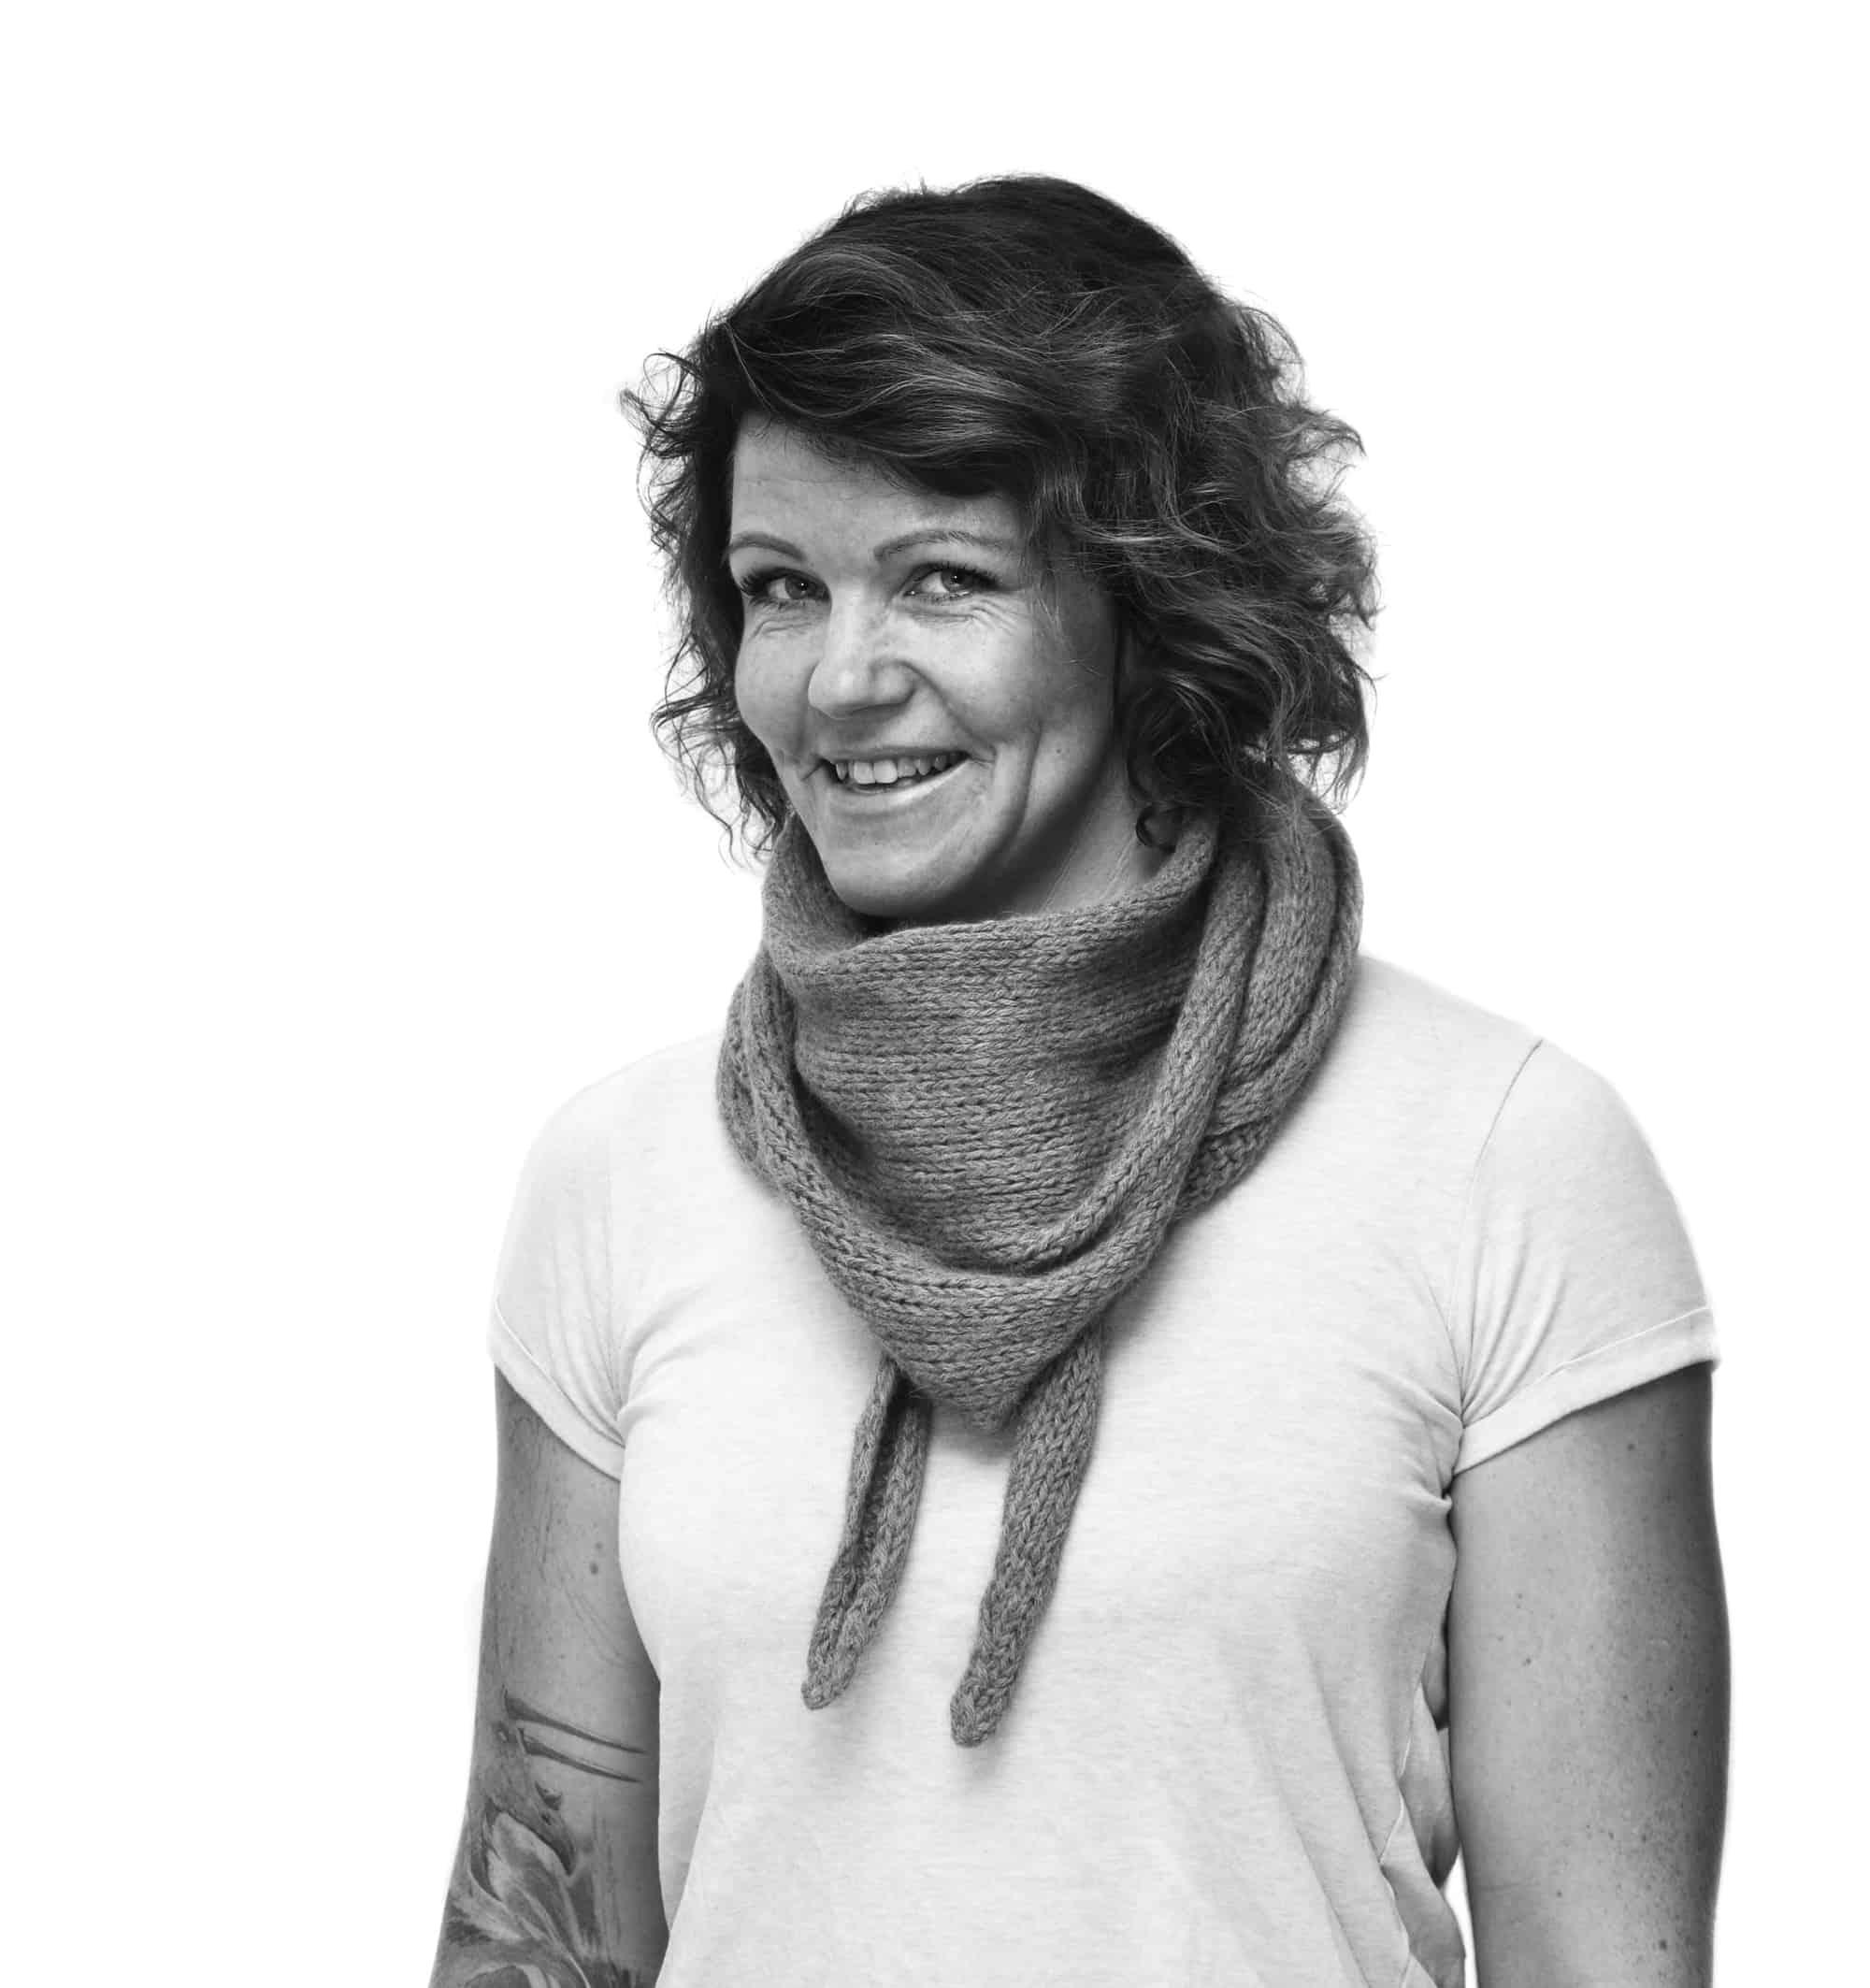 Karina Andresen